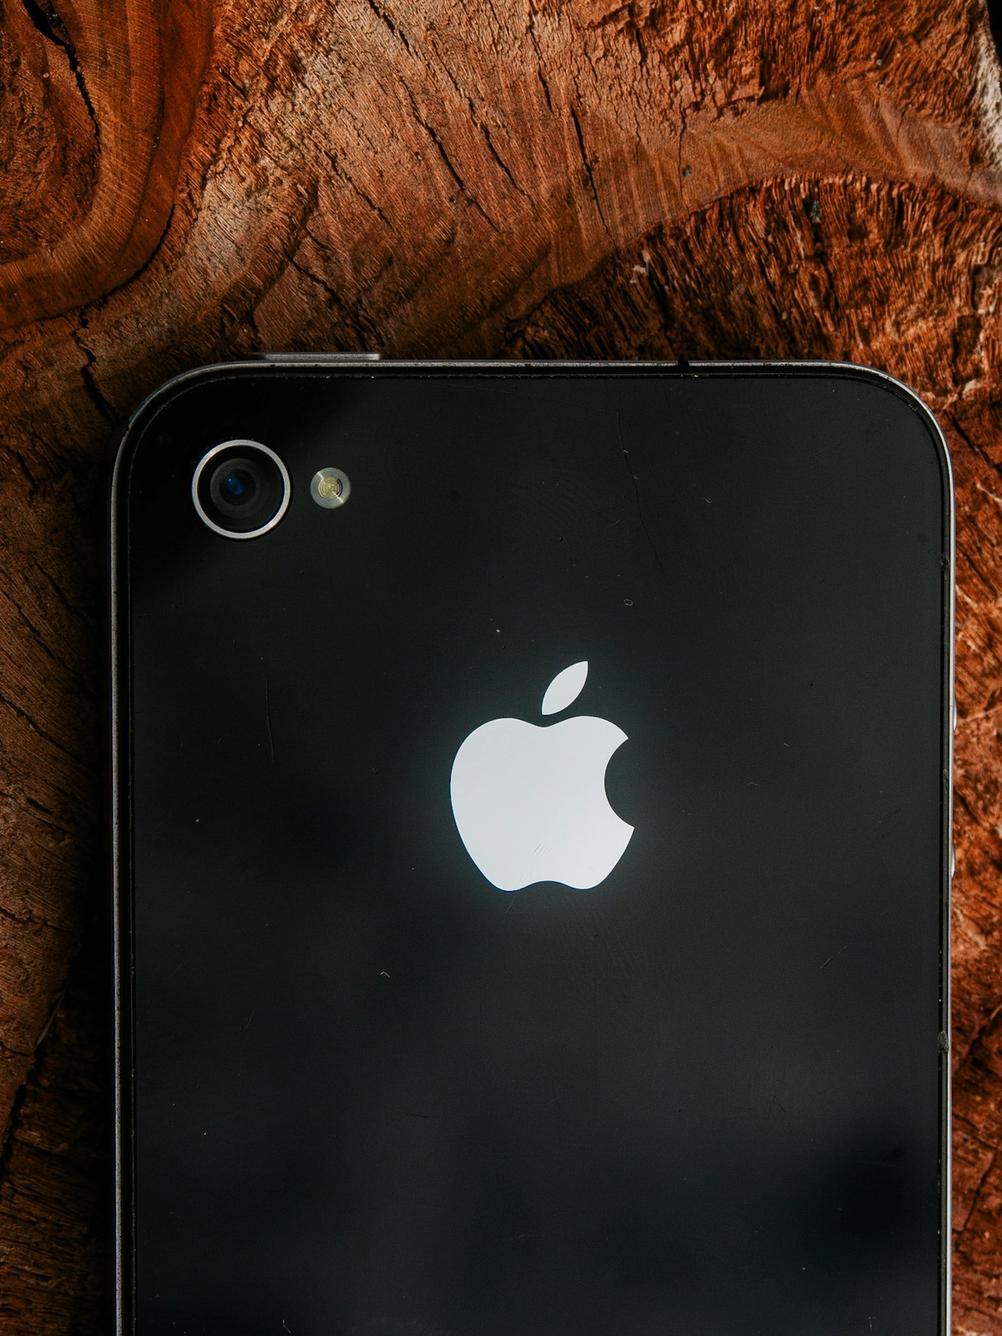 Photo of iPhone 4 rear camera.